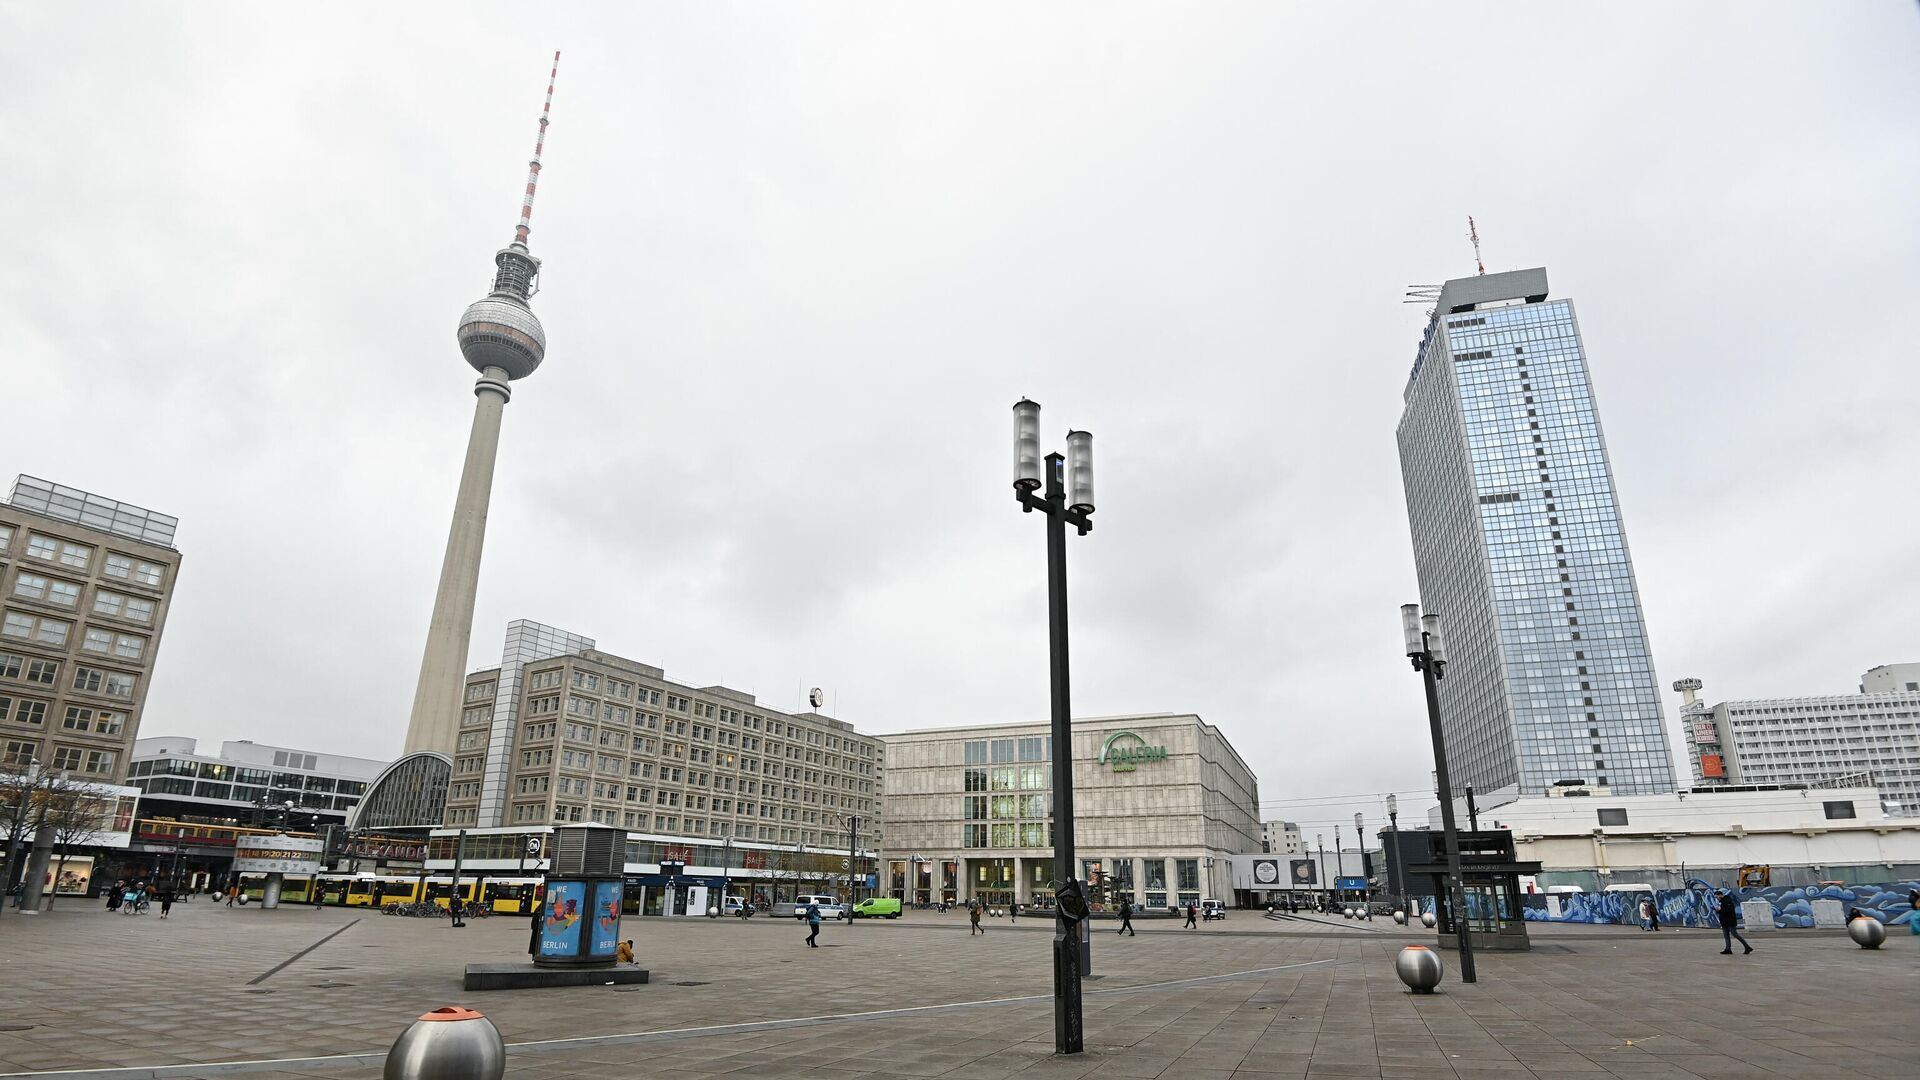 Der Alexanderplatz in Berlin (Archivbild) - SNA, 1920, 10.10.2021